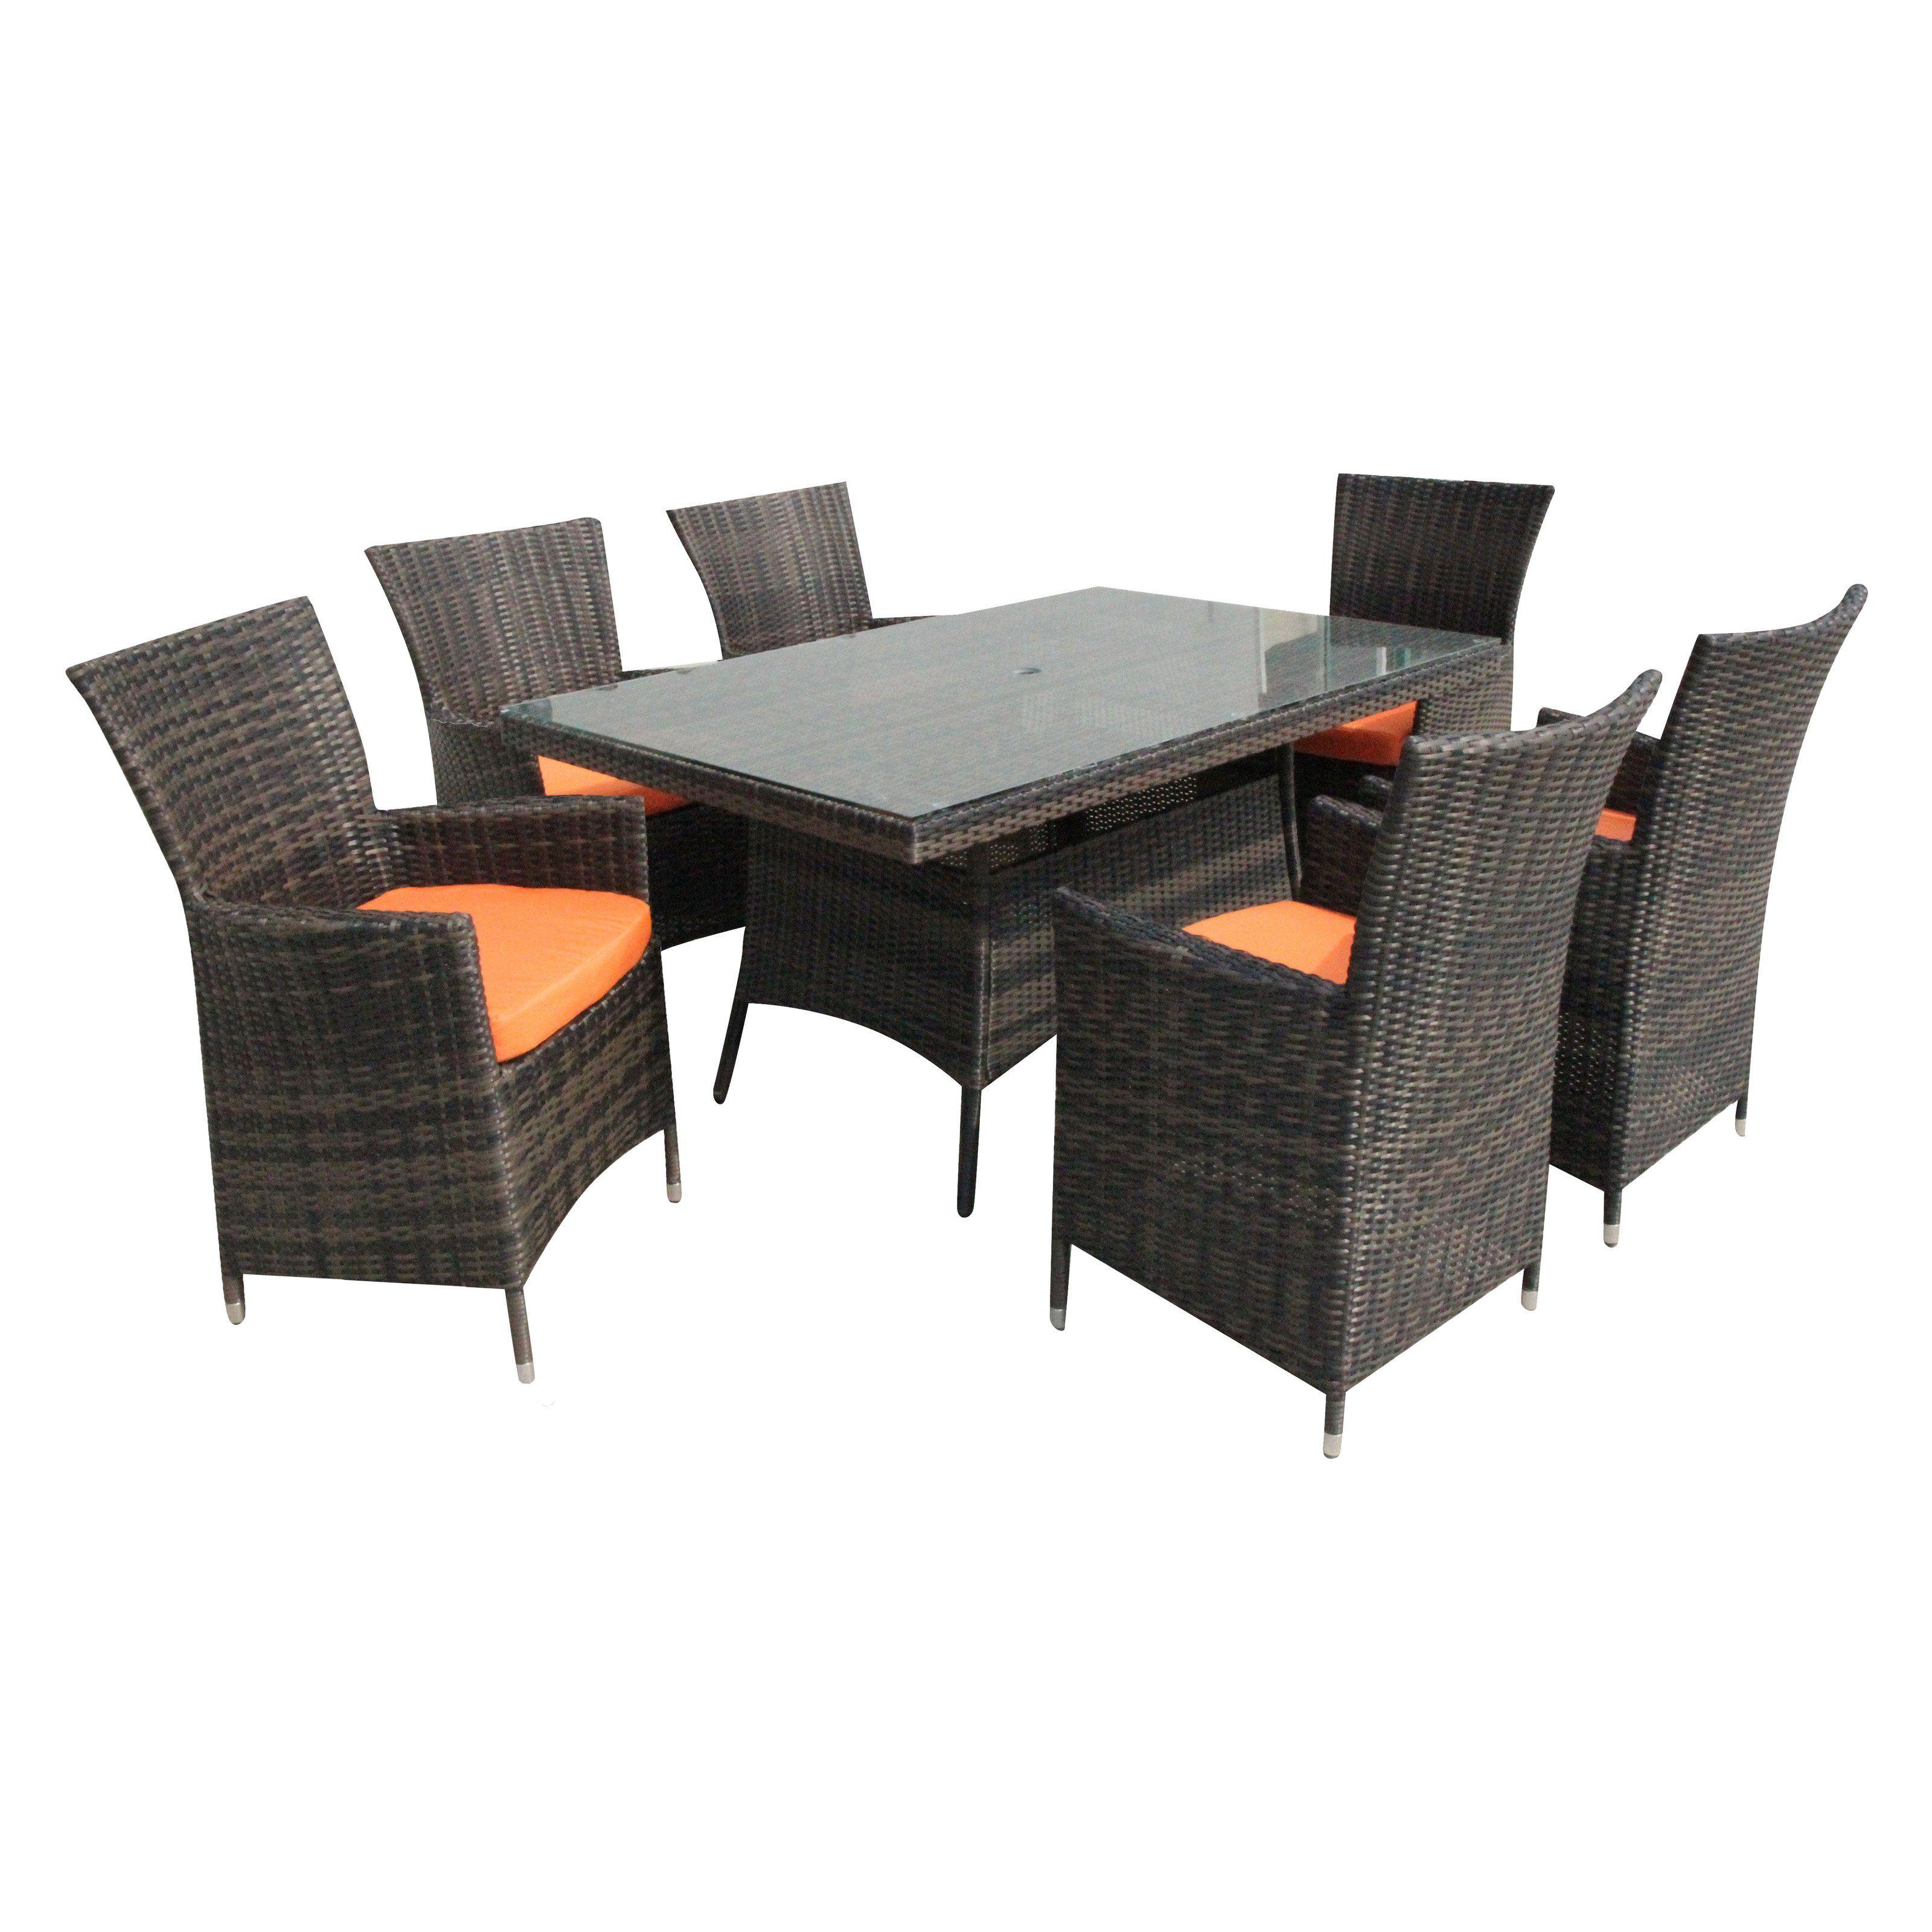 Kontiki Dominica Patio Dining Set - Seats 6 | www.hayneedle.com ...